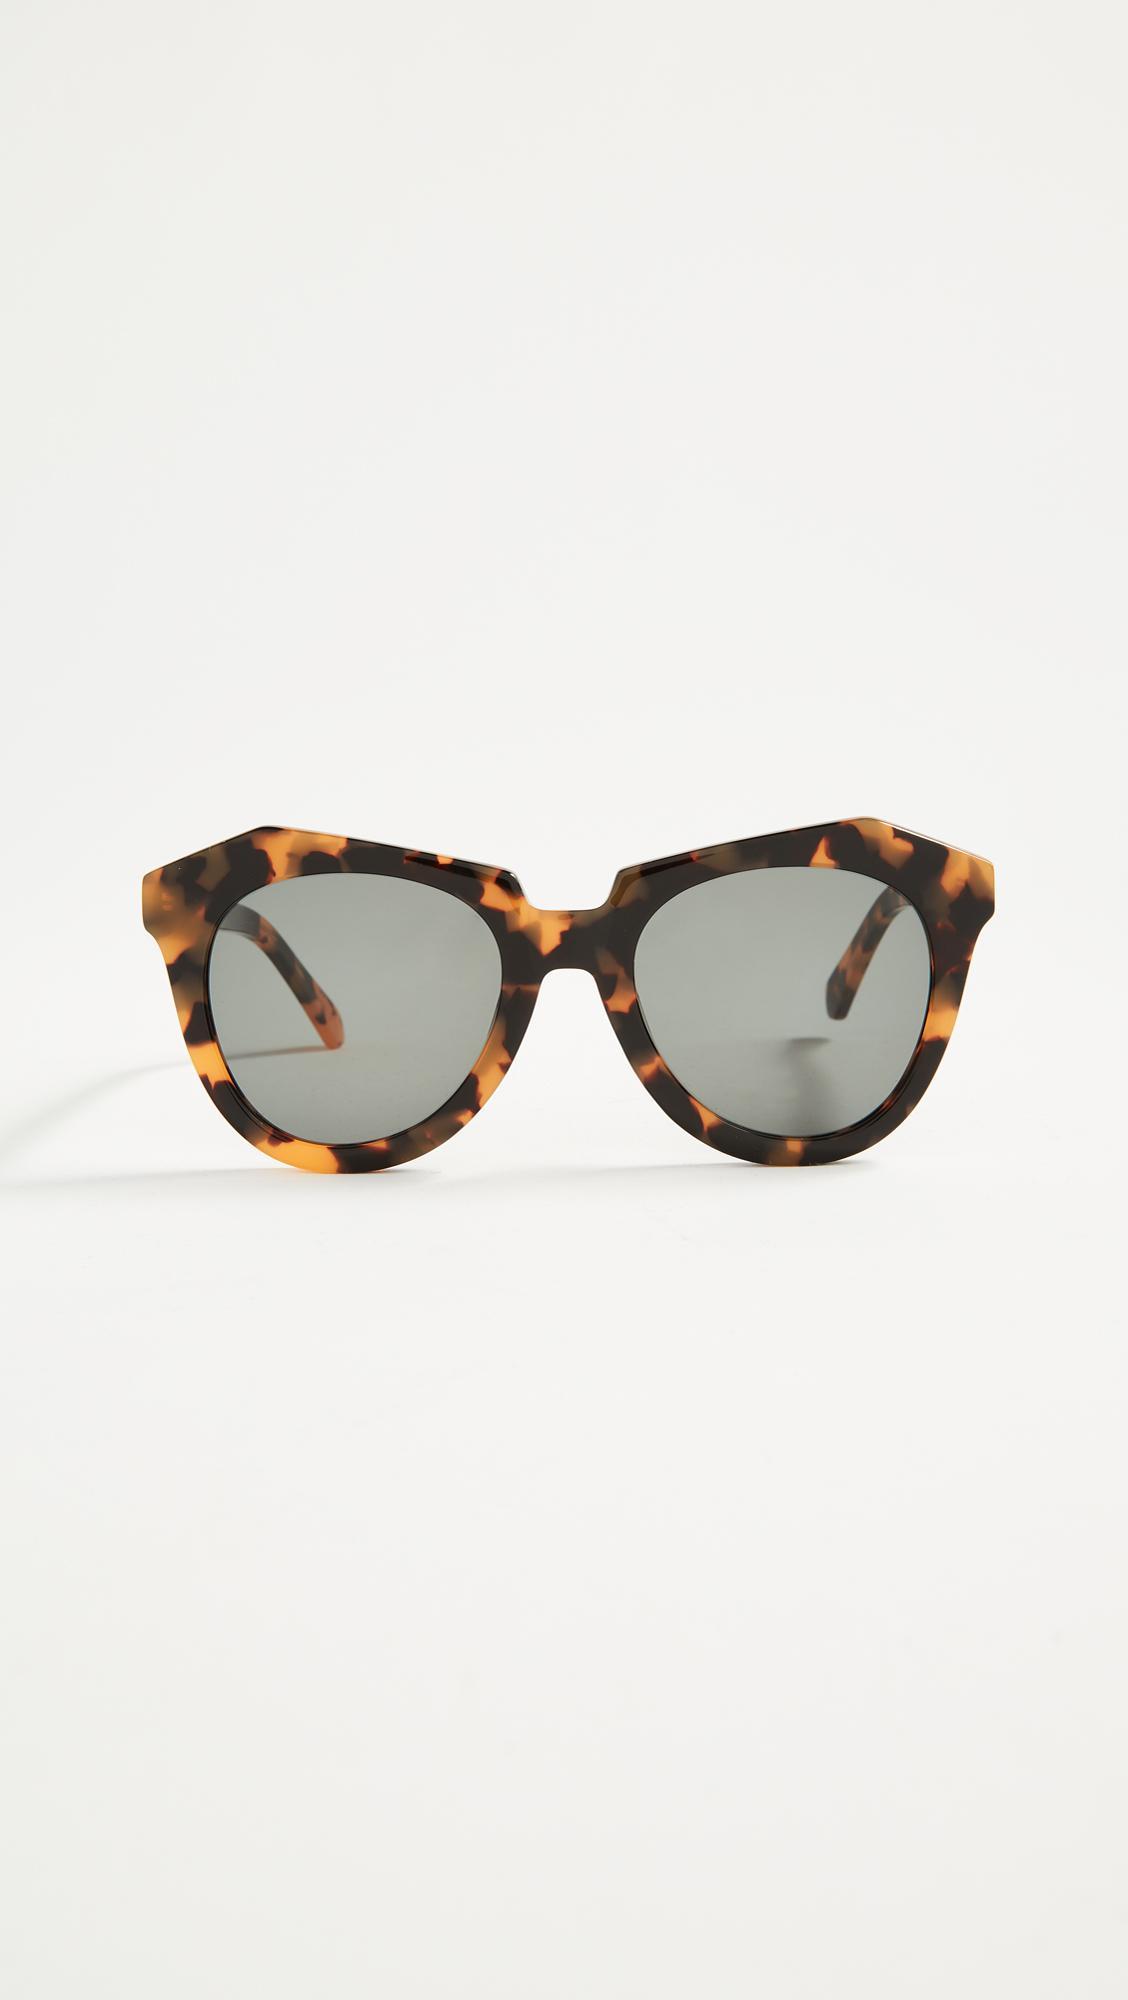 547fa6696ca Karen Walker The Number One Sunglasses - Lyst